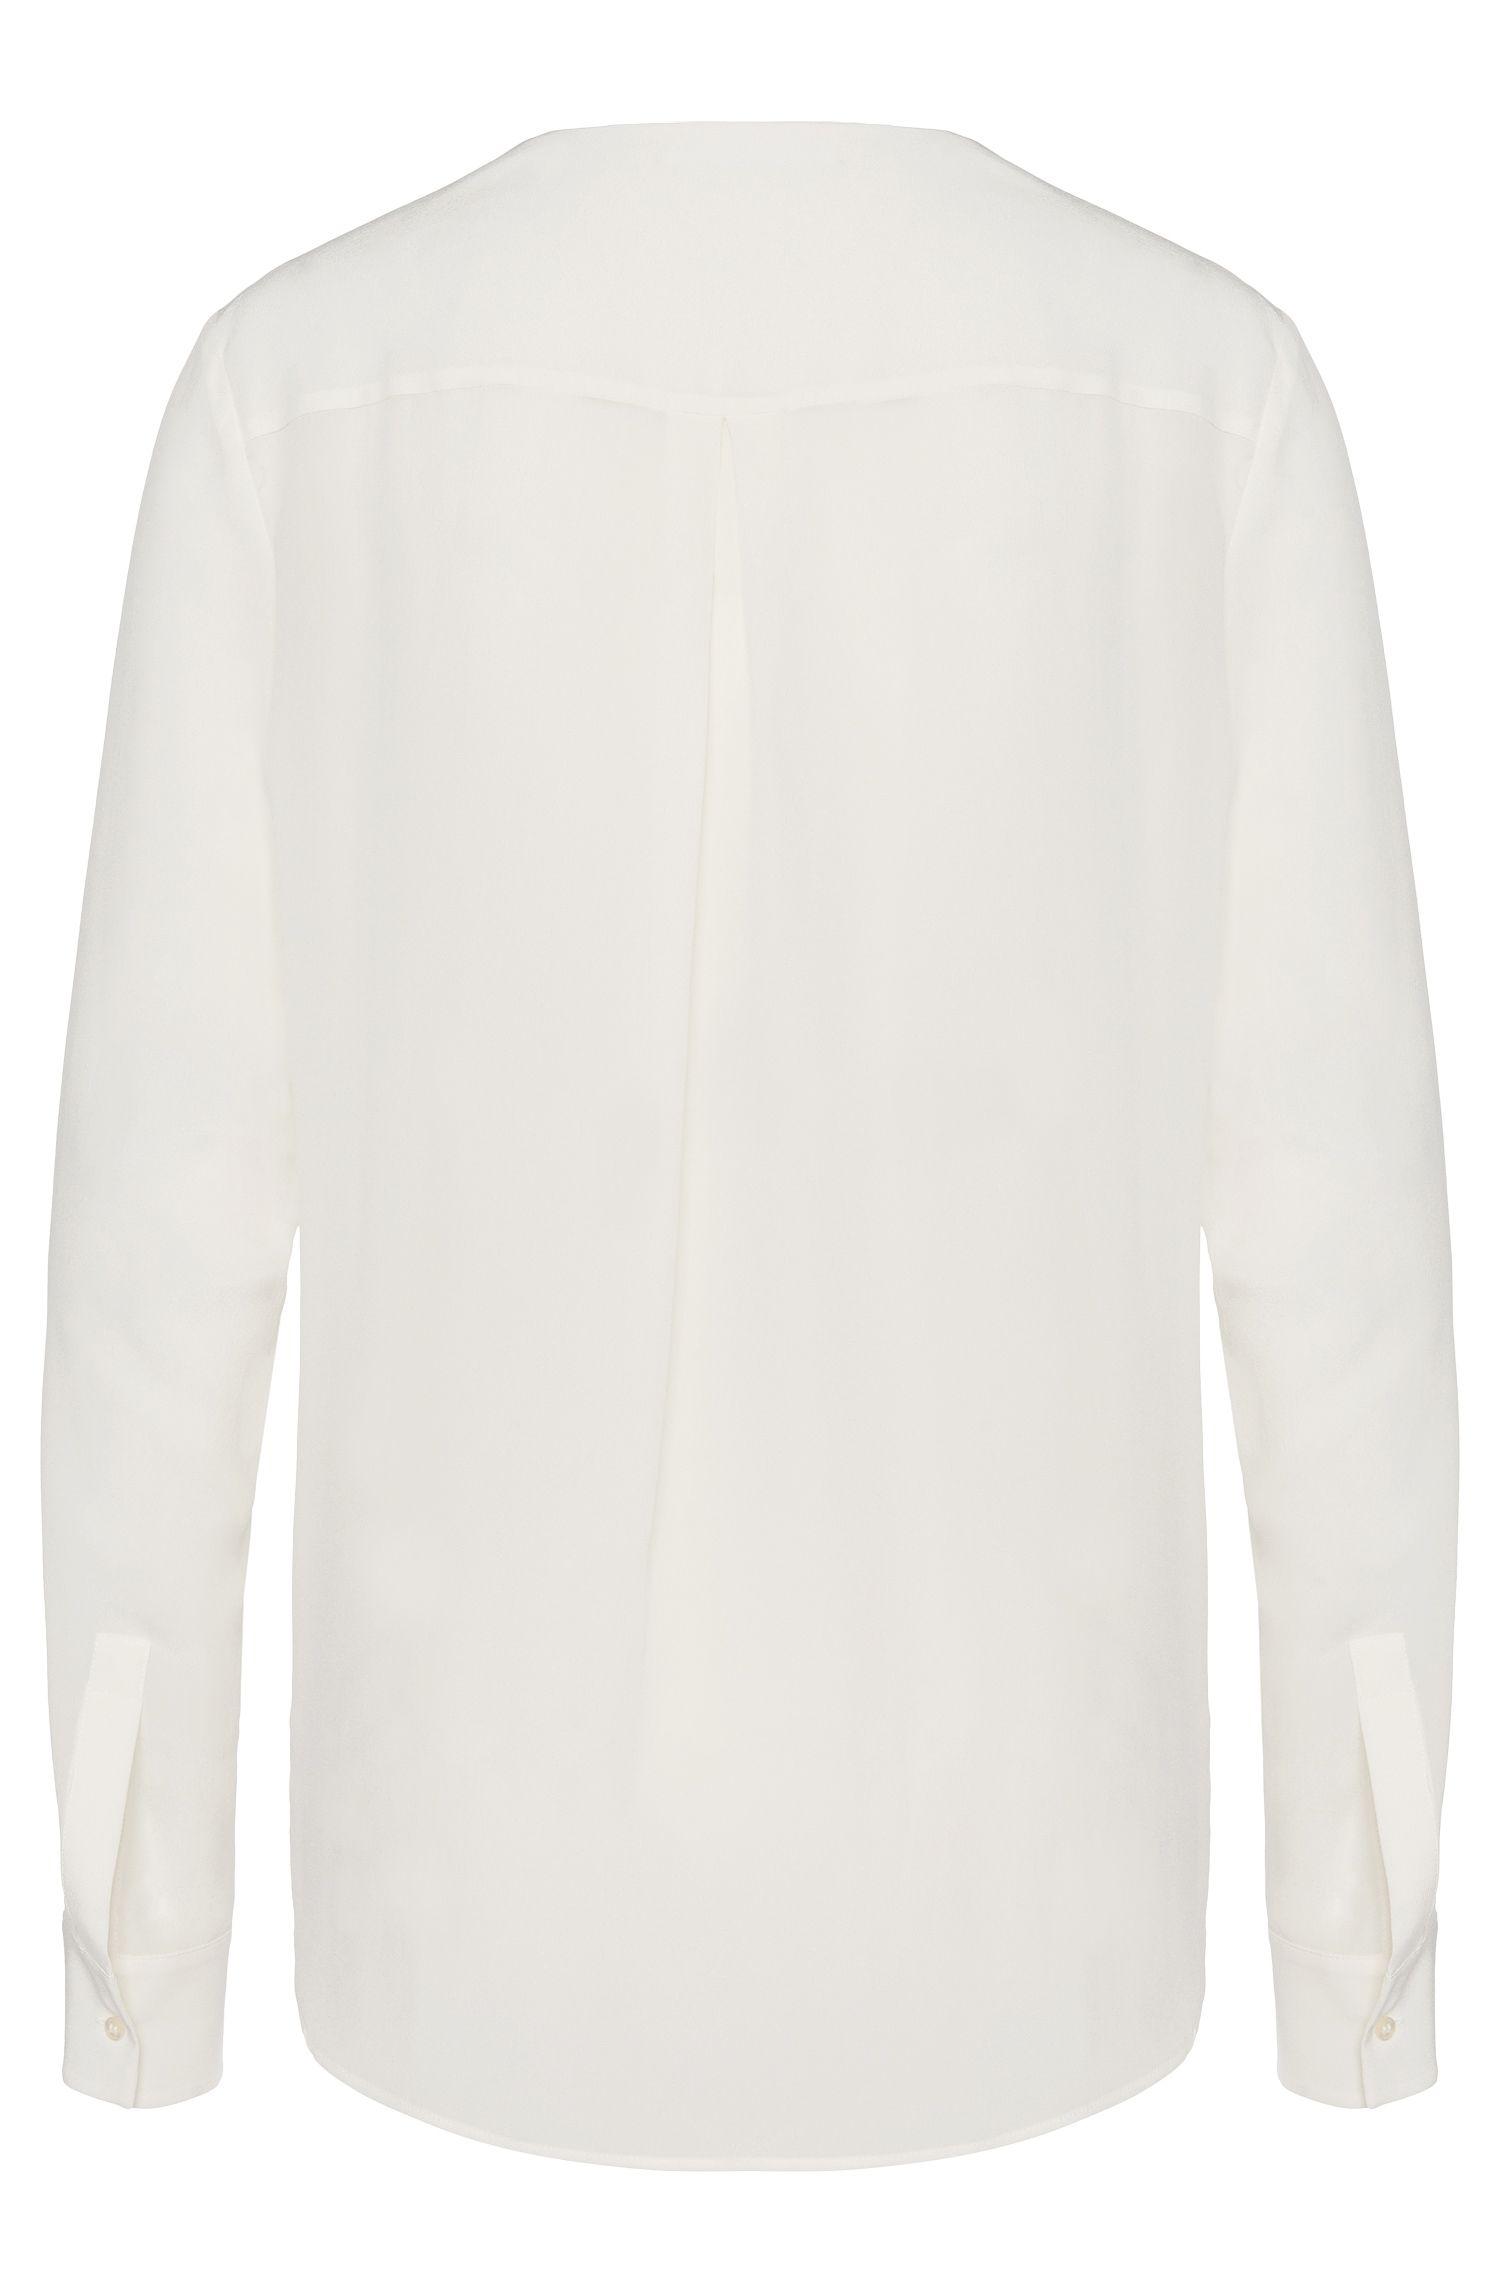 Standard-Fit Bluse aus Seide: 'Rosalinde'